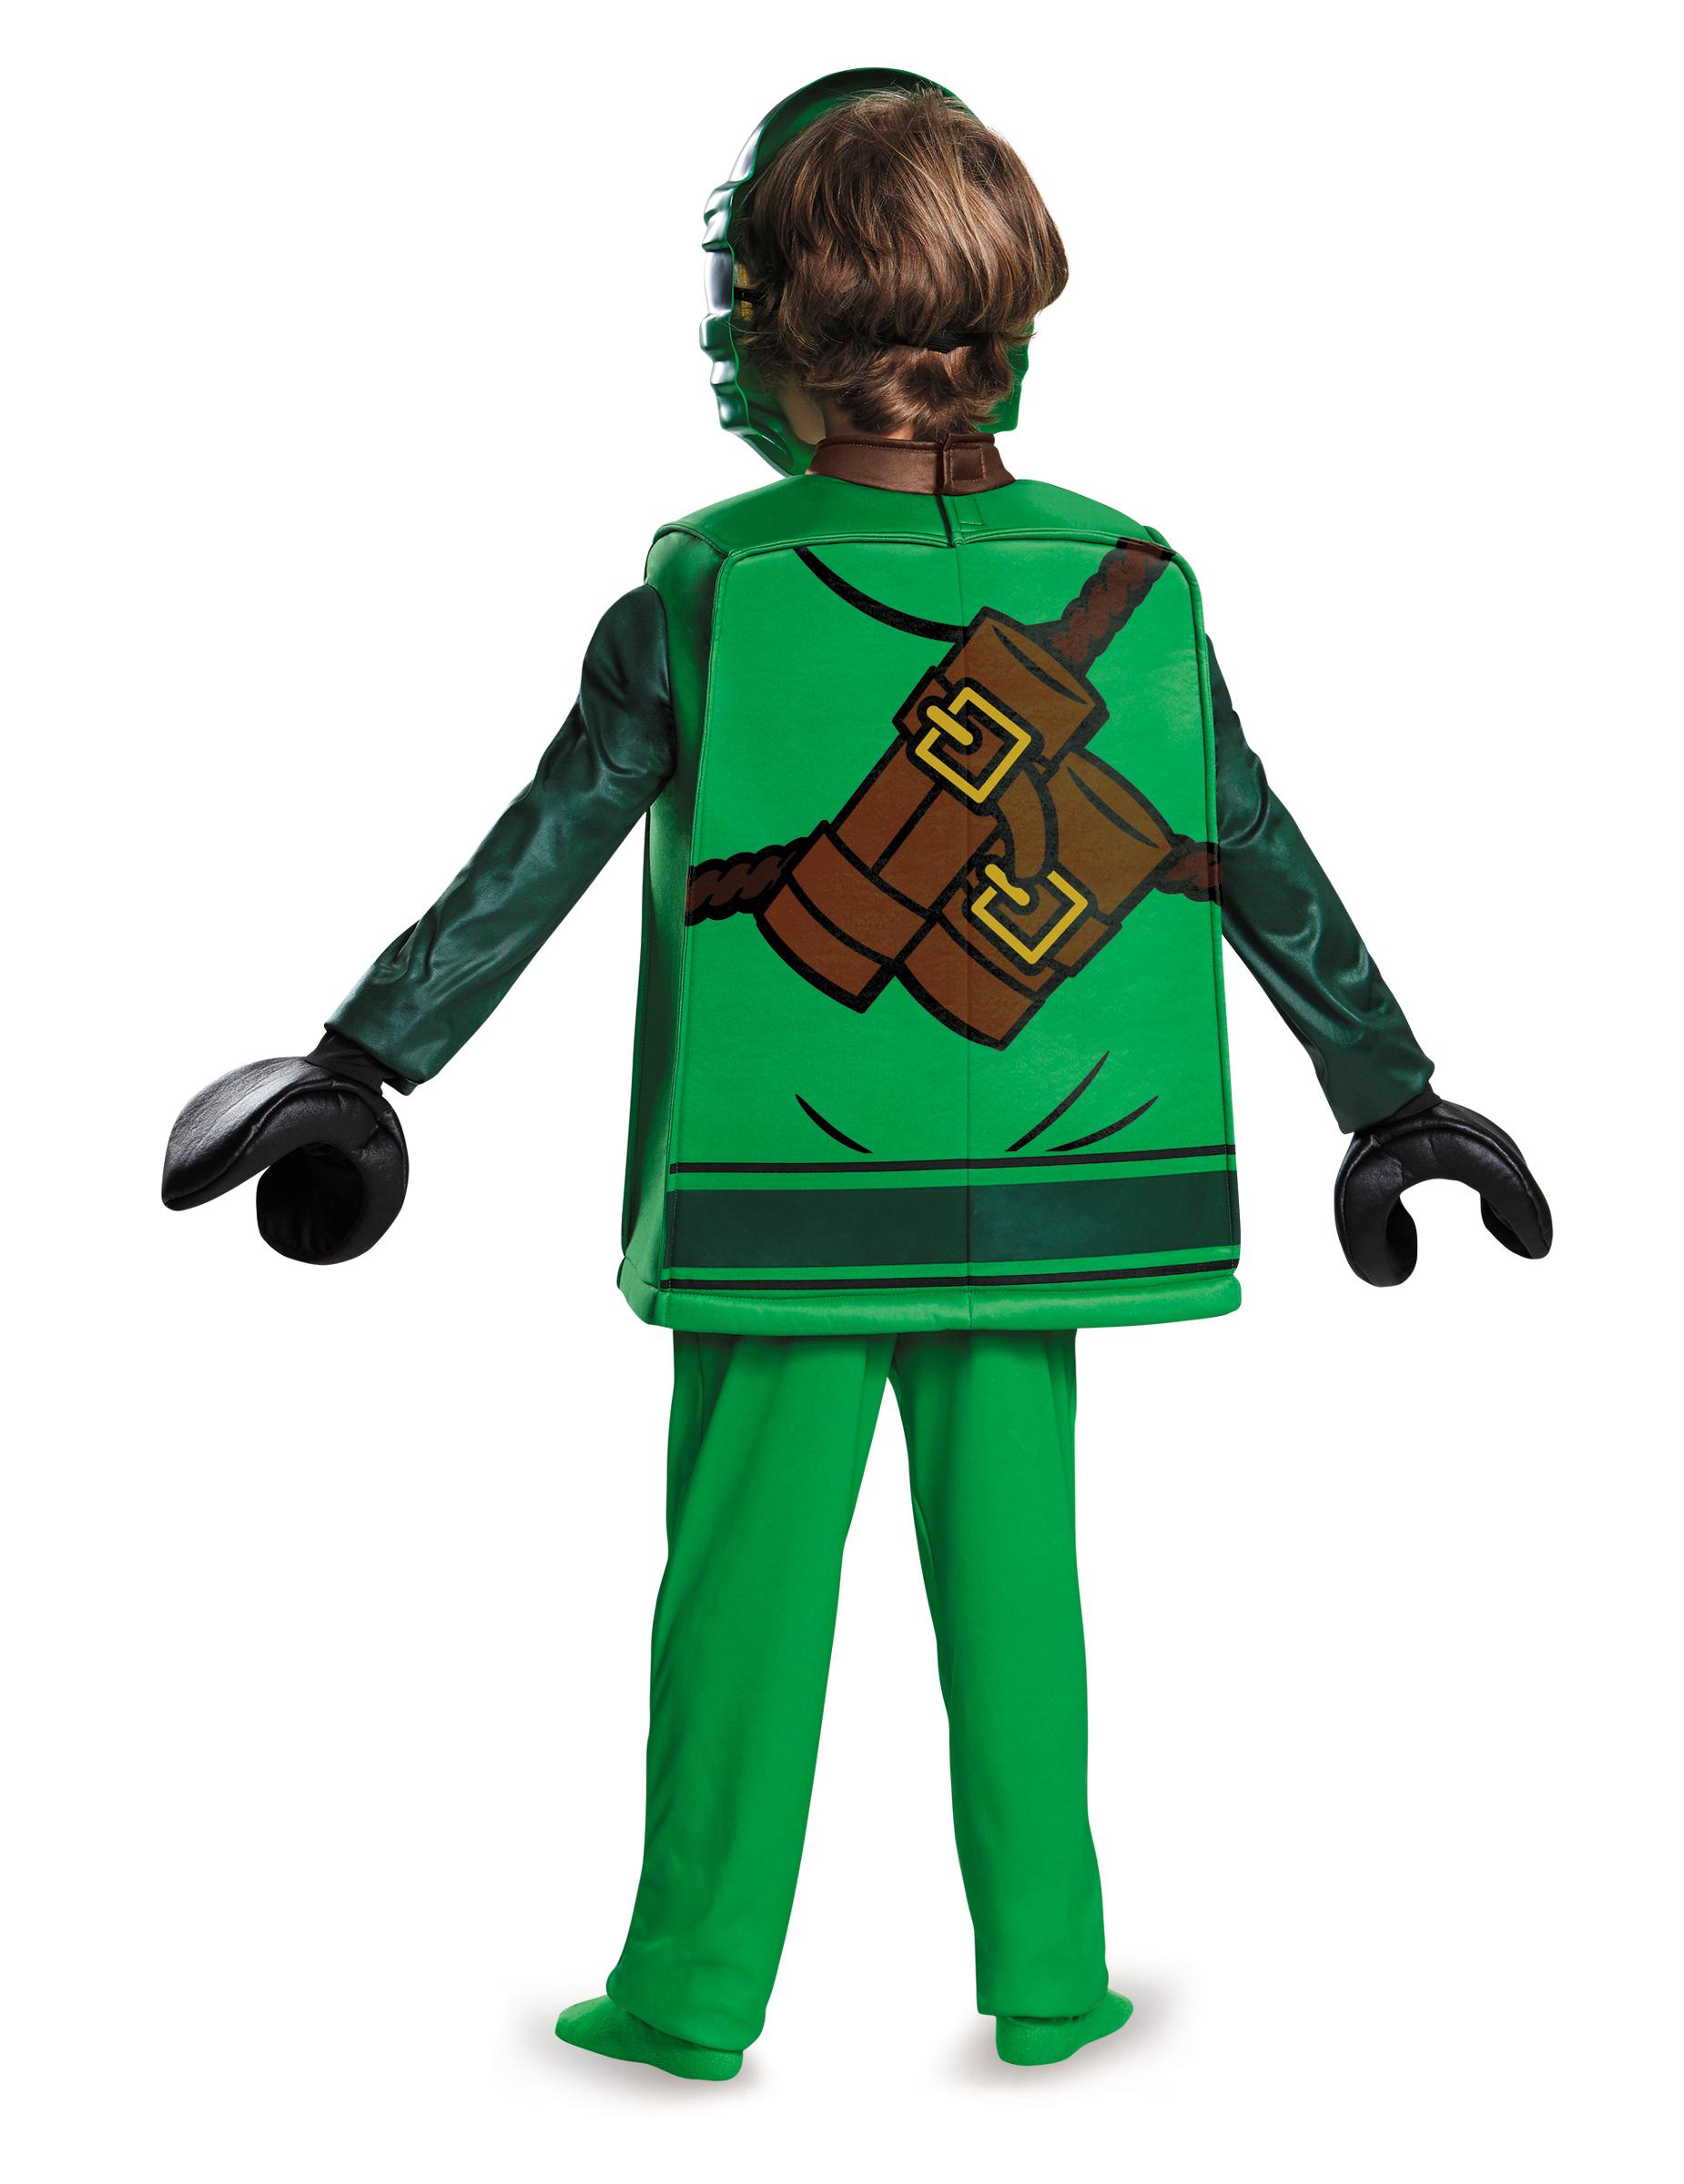 Exceptionnel Déguisement deluxe Lloyd Ninjago®- LEGO® enfant : Deguise-toi  TH21